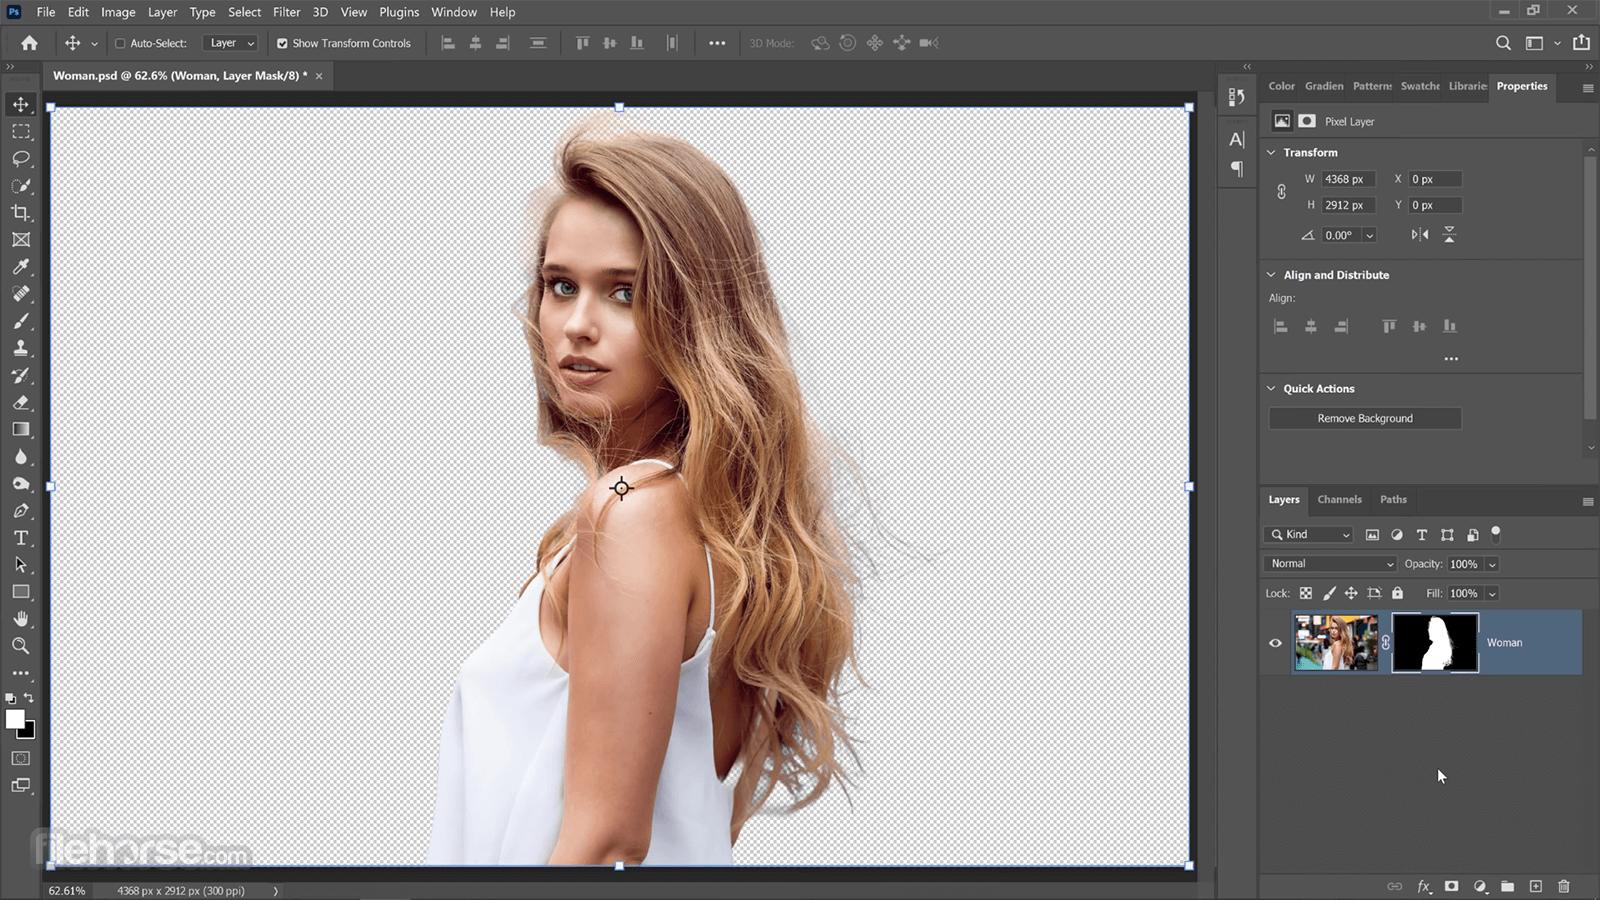 Adobe Photoshop CC 2021 22.3 (64-bit) Screenshot 4